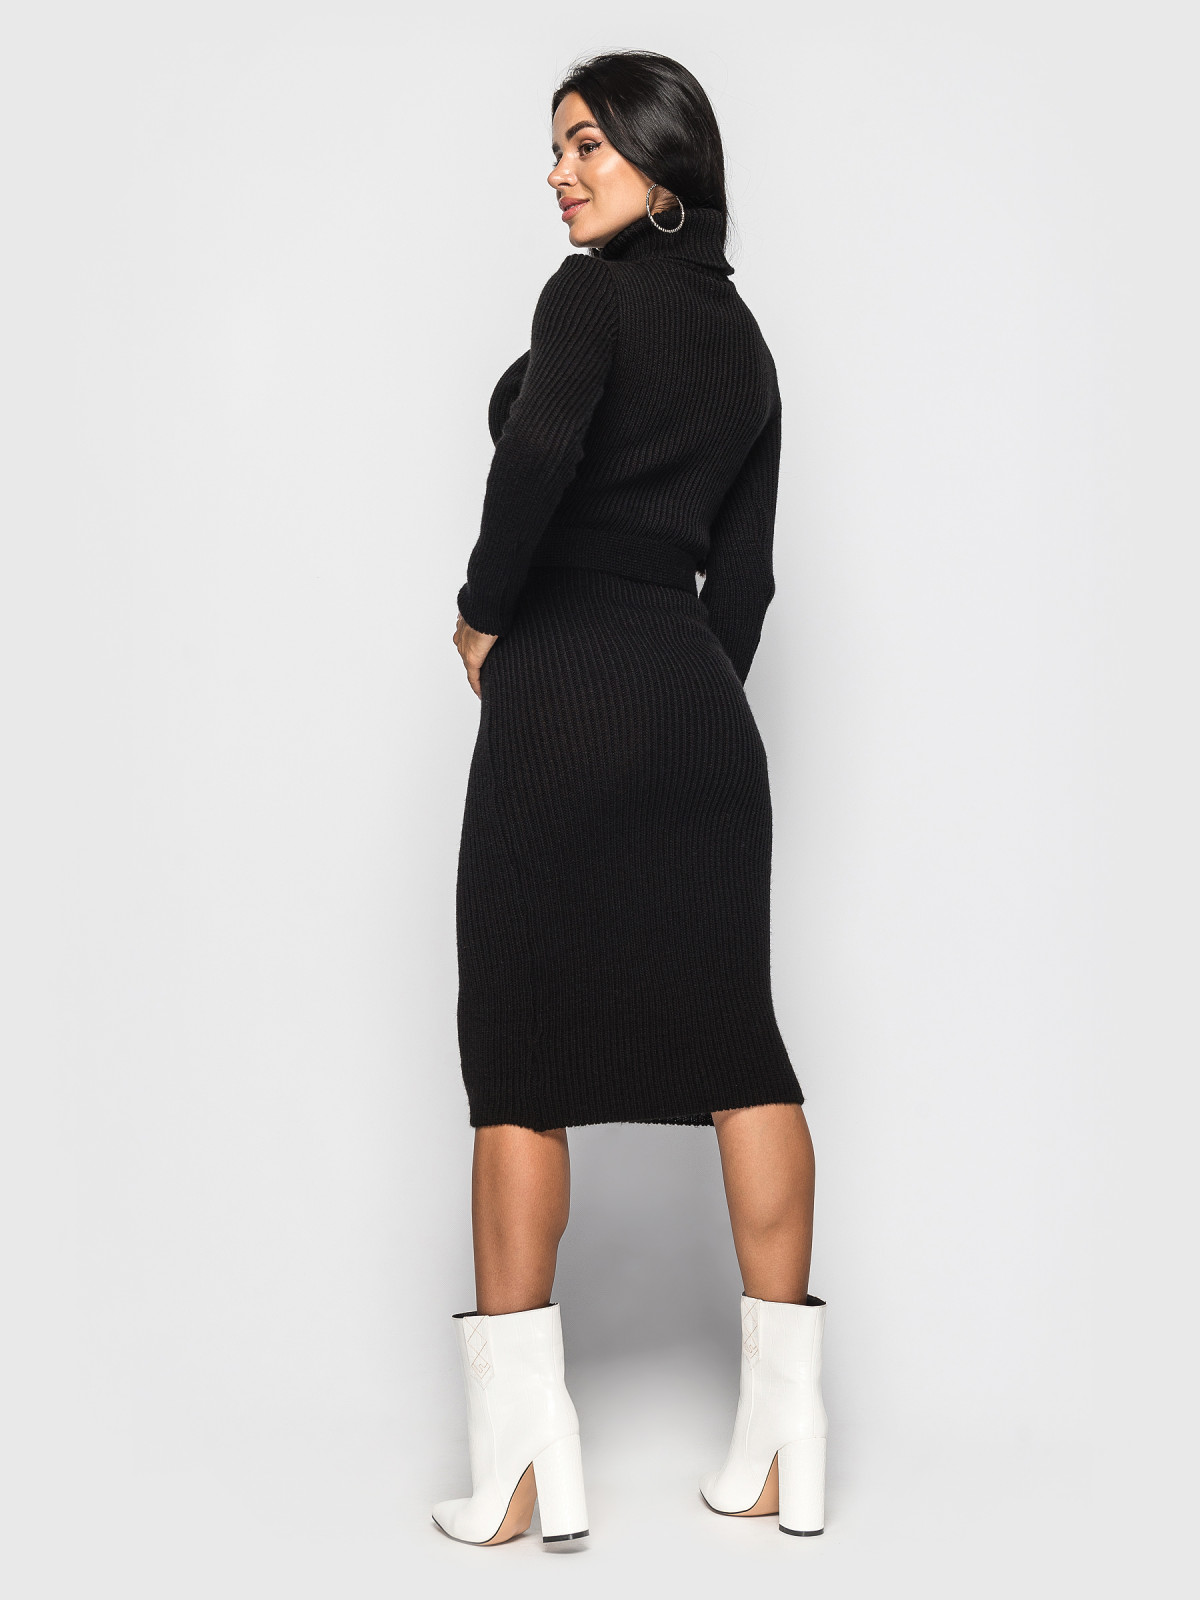 Платье вязаное Jasmine Чёрный